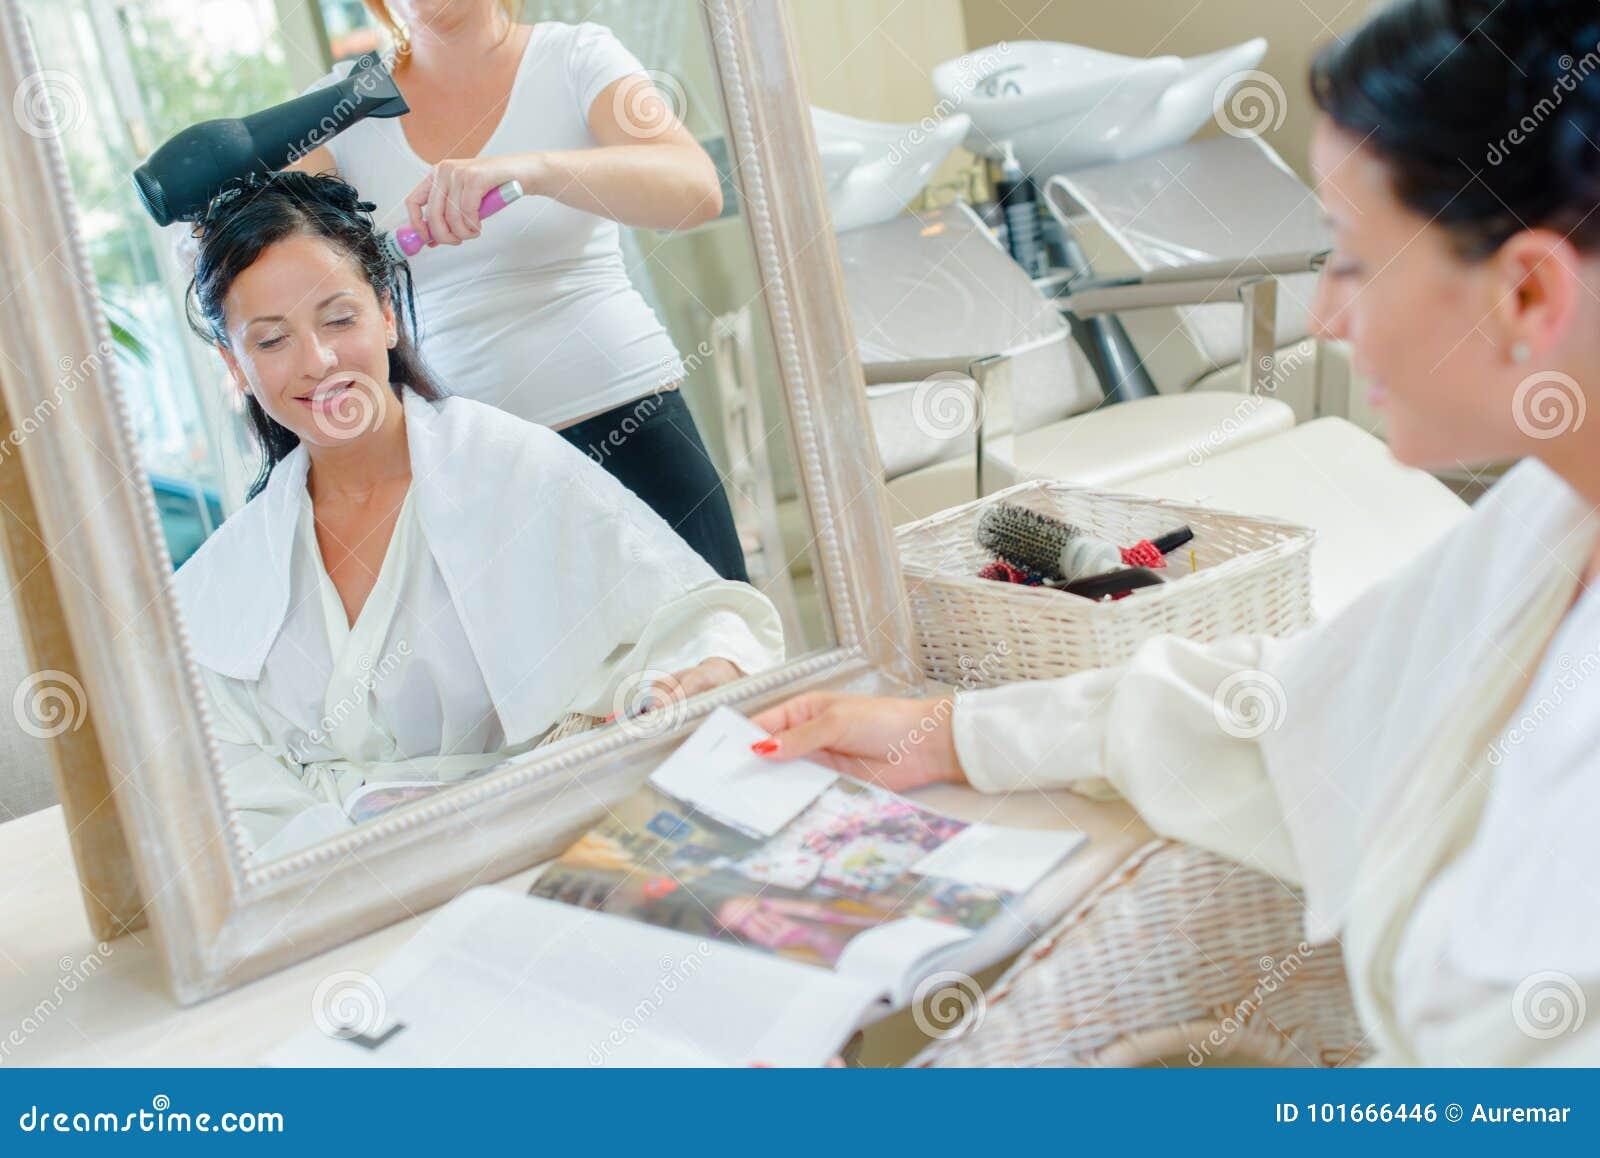 Woman having hair dried reading magazine